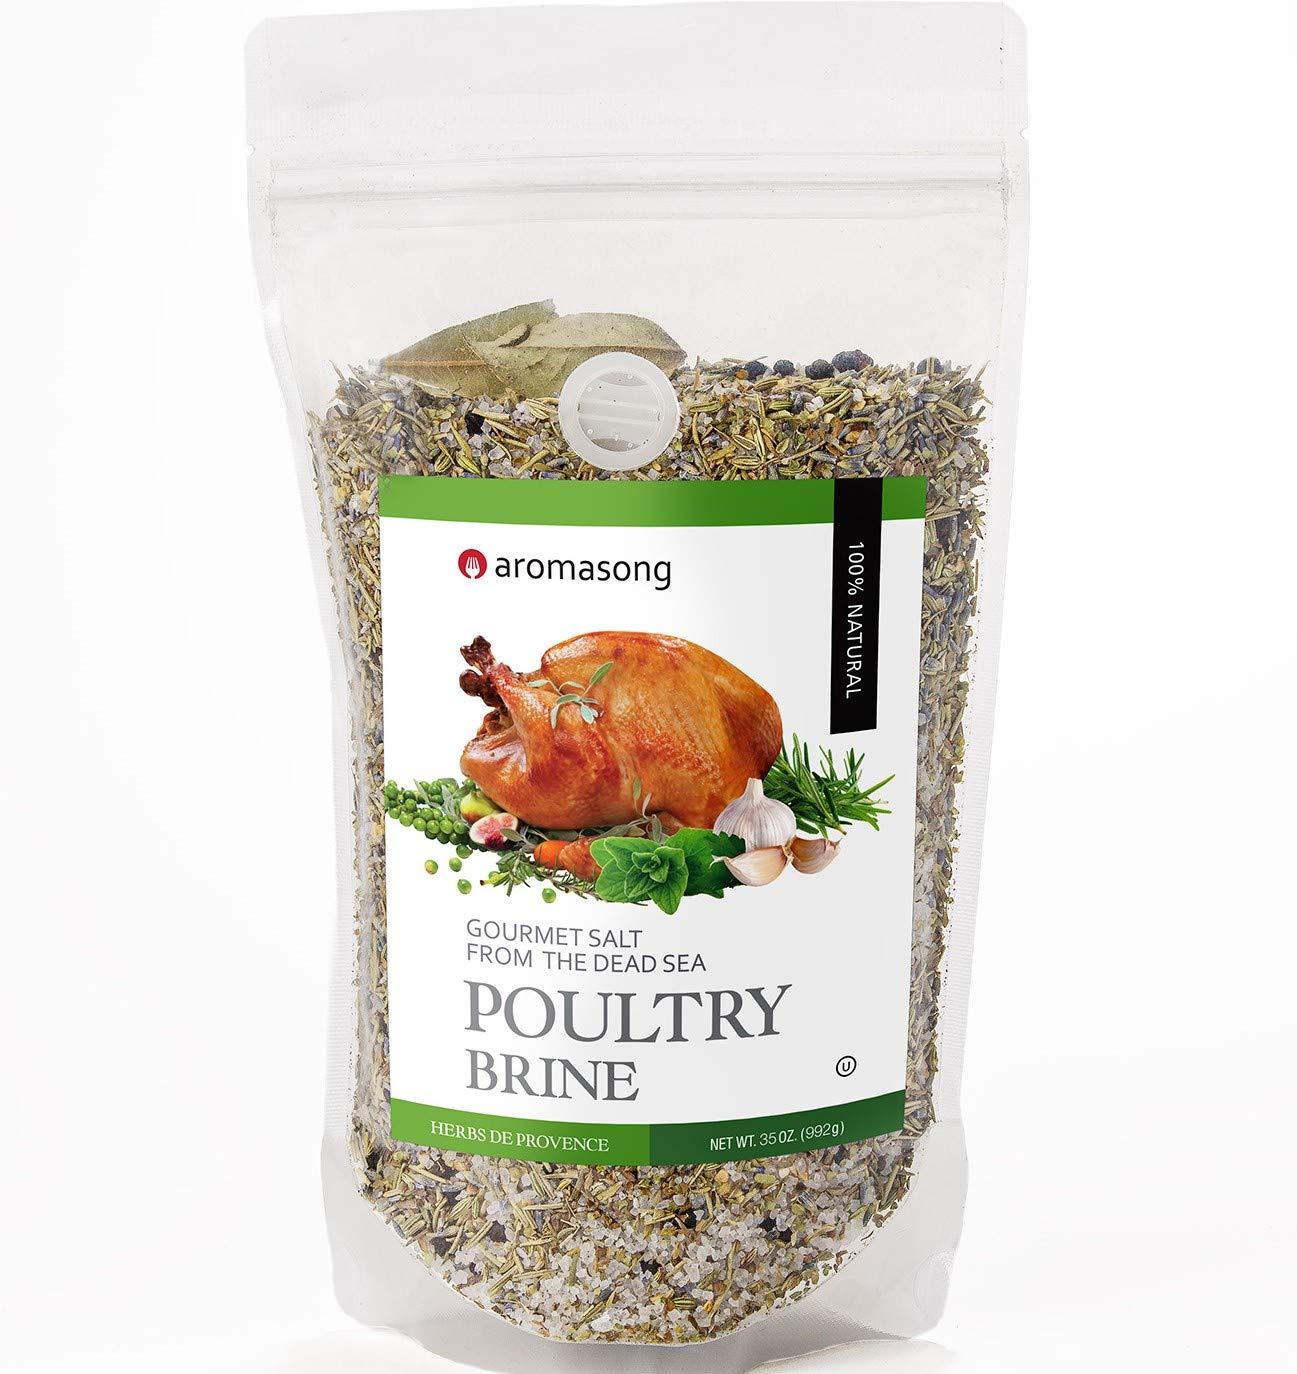 Aromasong Turkey Brine, HERBS DE PROVENCE, For Wet & Dry Brining, Bulk 2 Lb. Bag, 100% Natural, Gourmet Sea Salt Poultry Seasoning, for Roasting, Grilling, & Smoking for Brisket, Chicken, Pork & Beef.